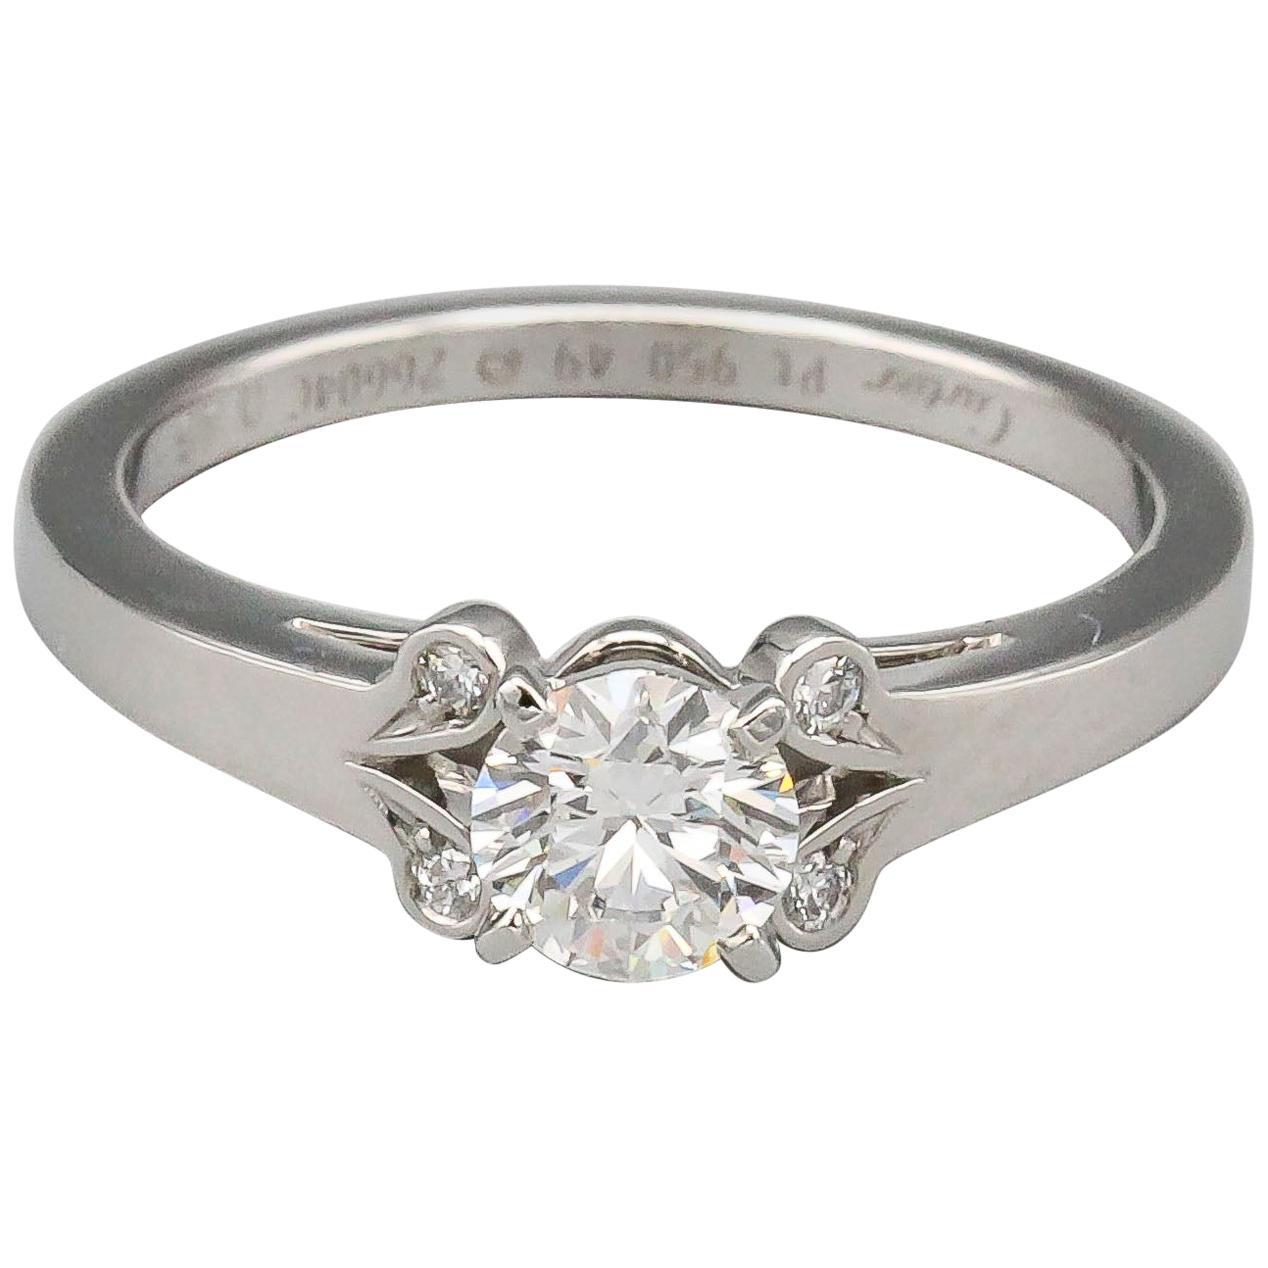 Cartier Ballerine .45 Carat F VVS1 Diamond Platinum Engagement Ring